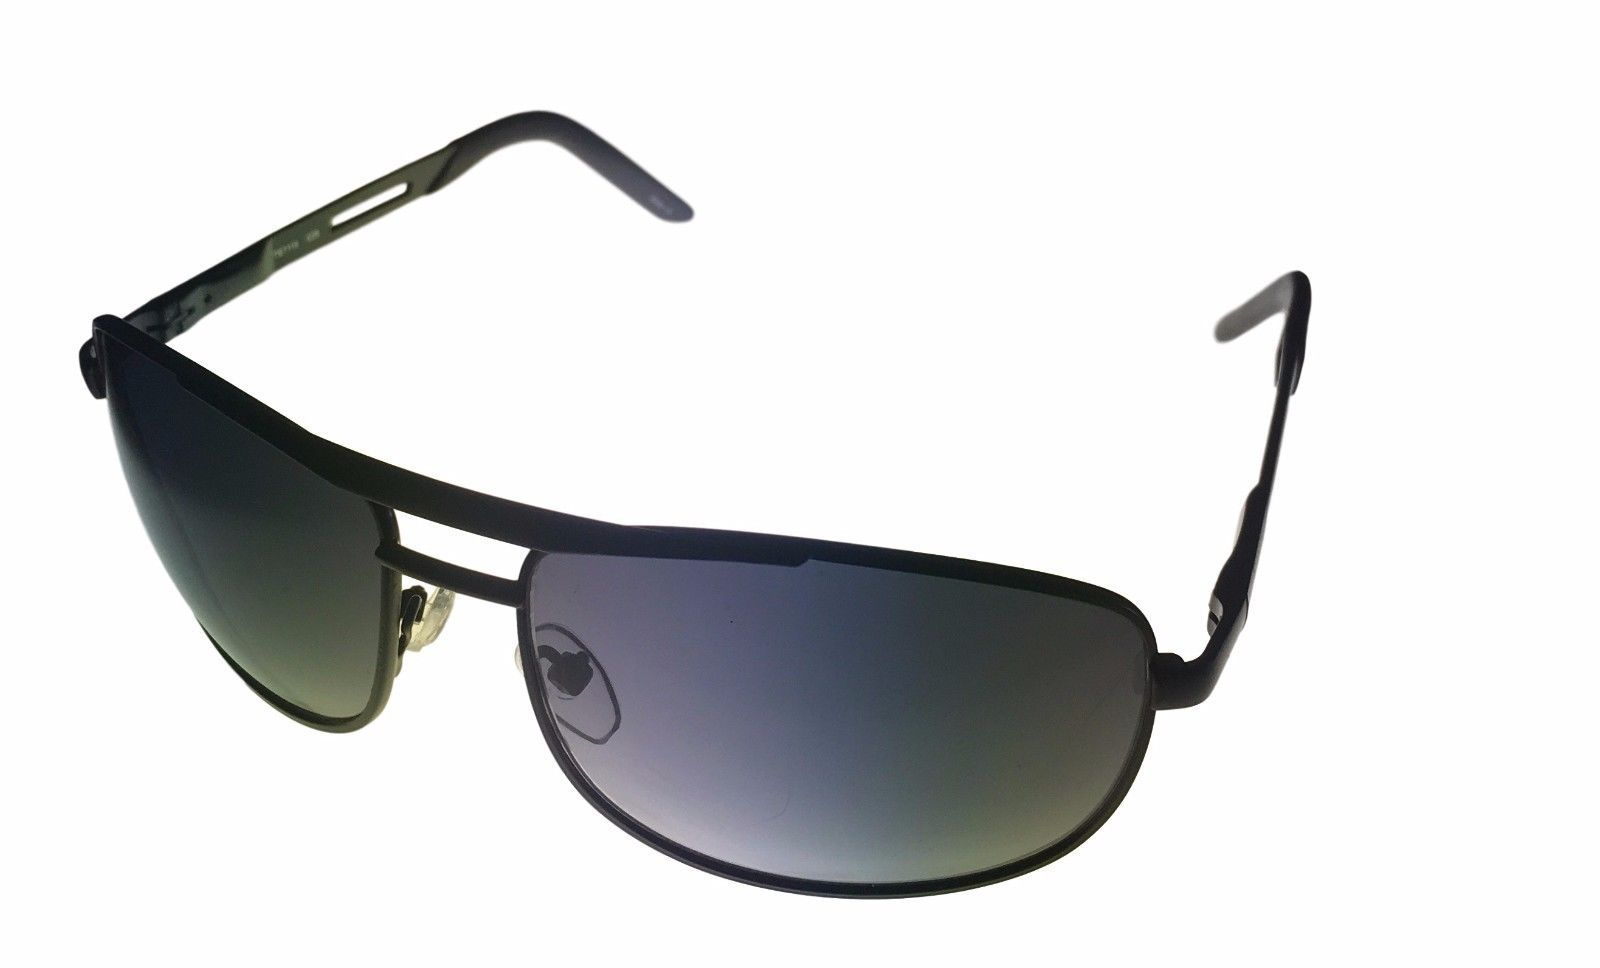 Timberland Mens Sunglass Black Rimless Metal Aviator Solid Smoke Lens TB7113 2A